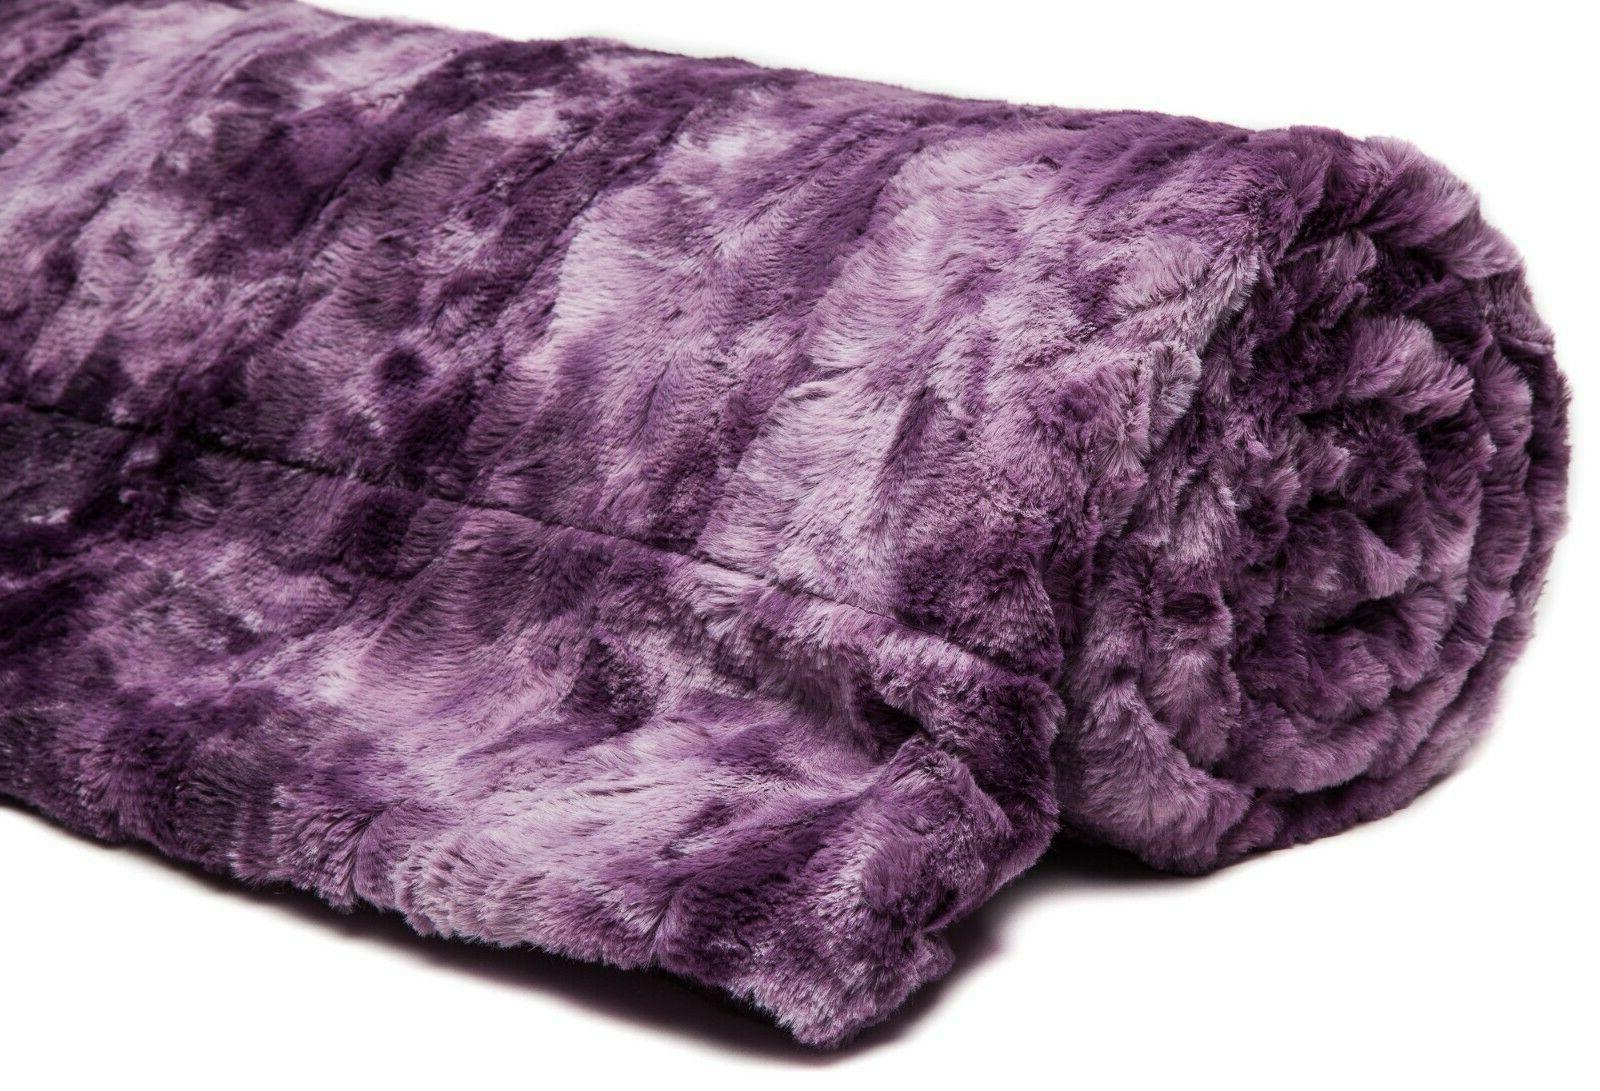 Chanasya Blanket Warm Fluffy Sherpa Couch